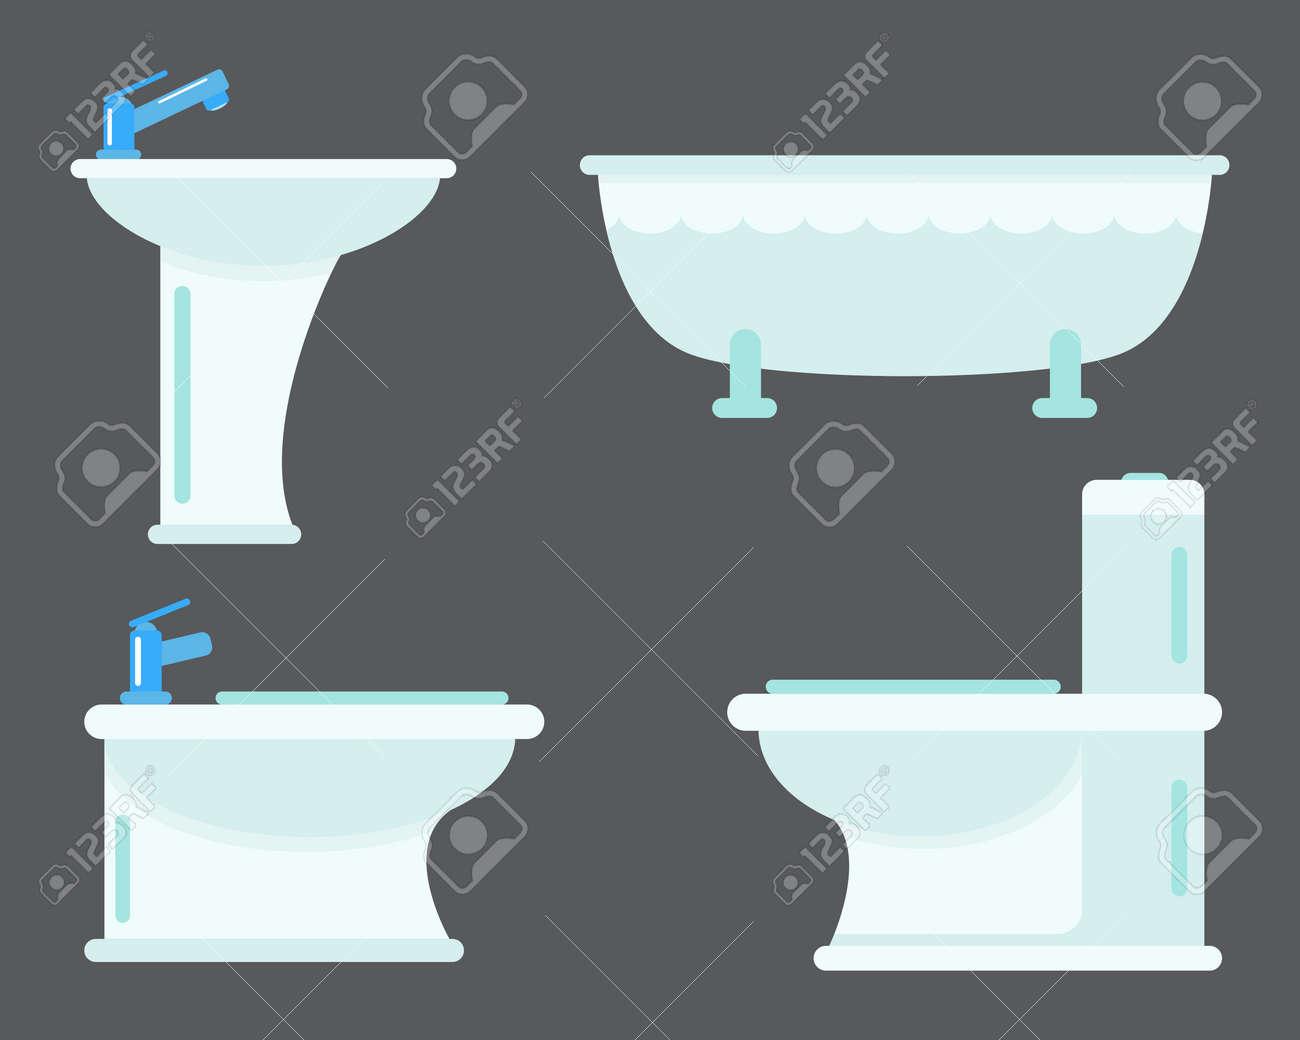 Bad apparatuur icoon toilet kom badkamer schoonheid plat stijl